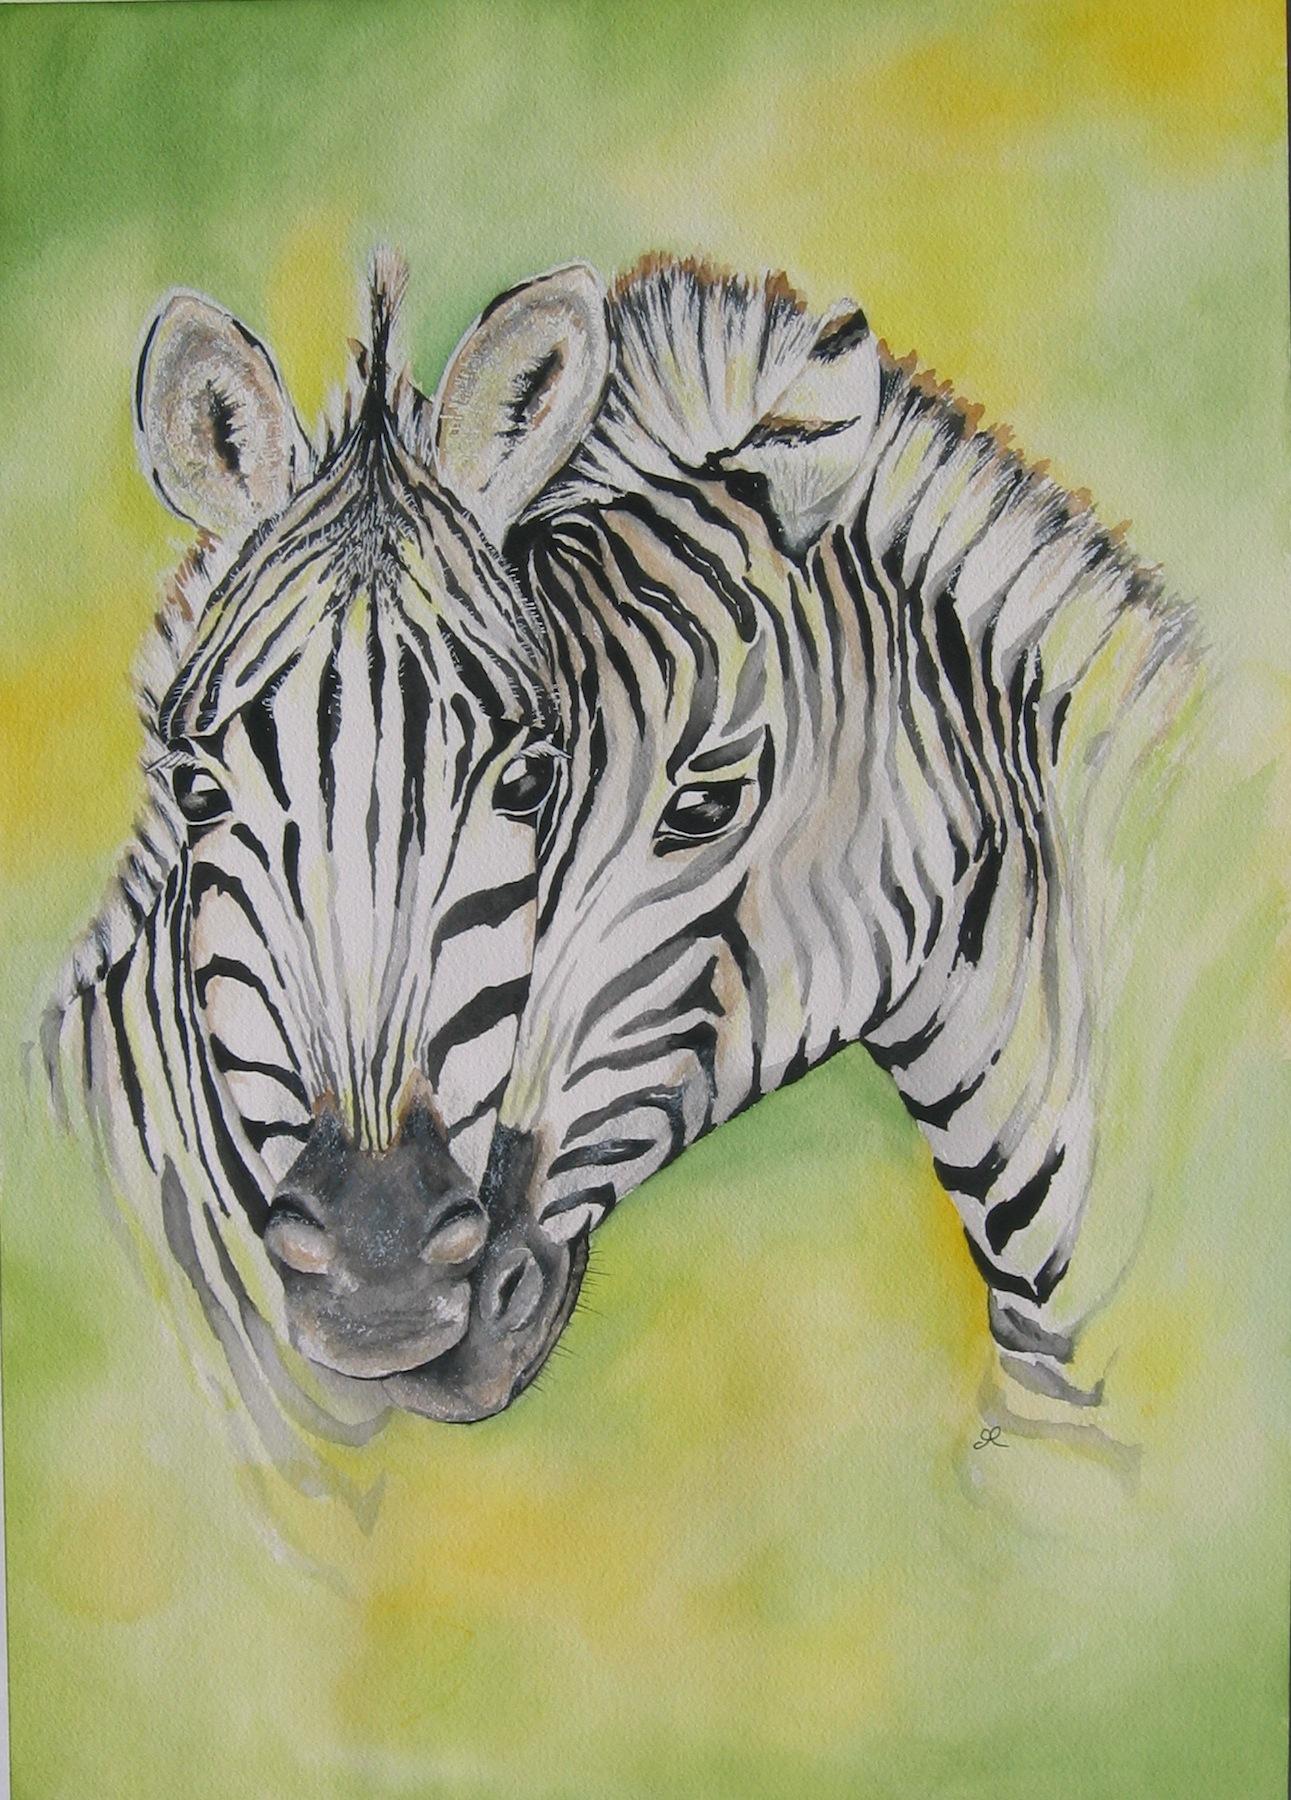 Zebras by visionary artist Madeleine Tuttle